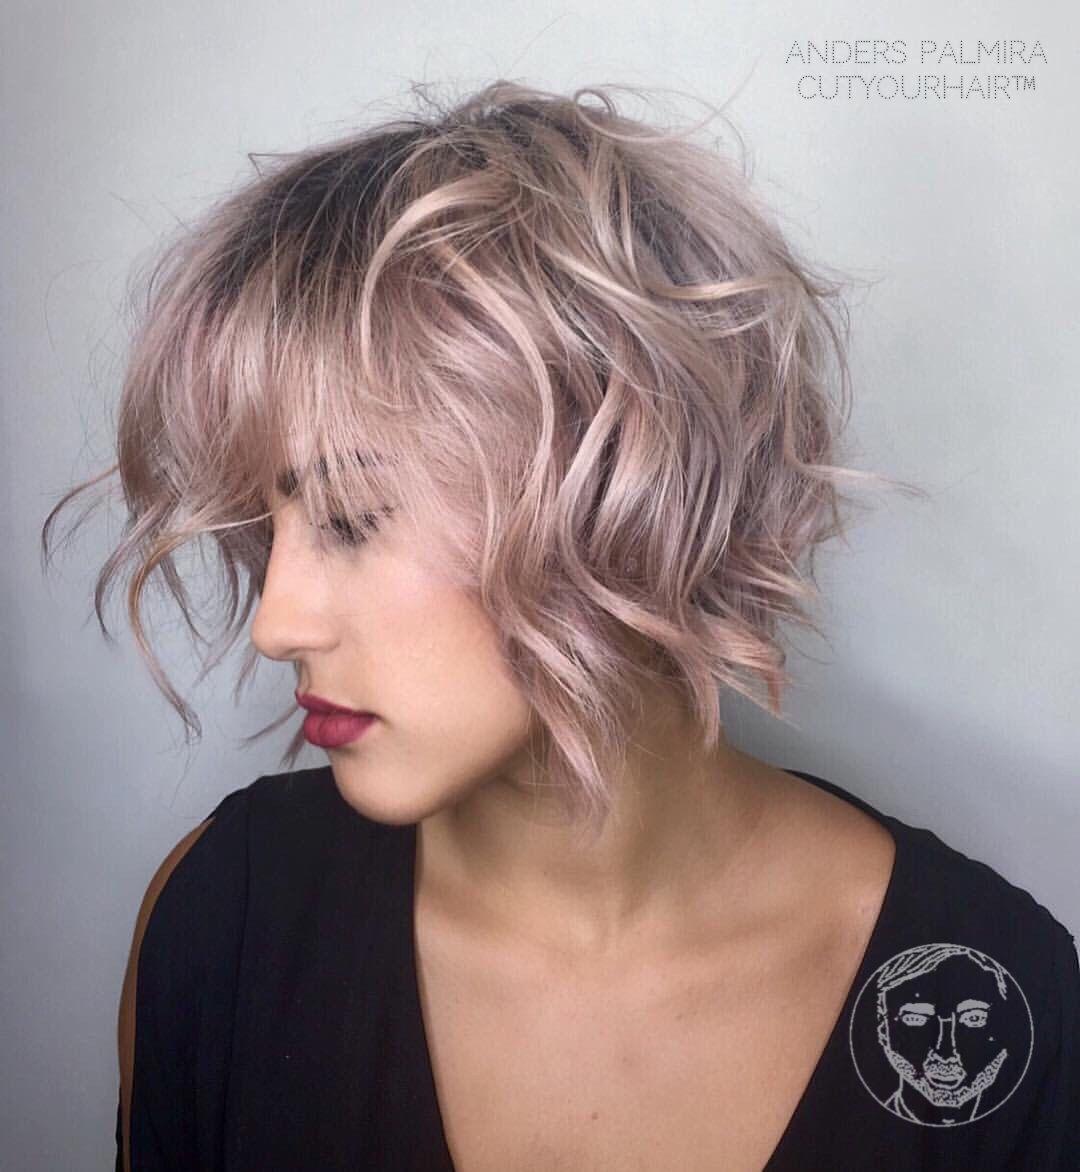 Short Fine Curly Hair Haircuts Short Hairstyles For Fine Wavy Hair Women Short Hairstyles Idea Penteados Encaracolados Curtos Cabelo Curto Cabelo Curto Chique